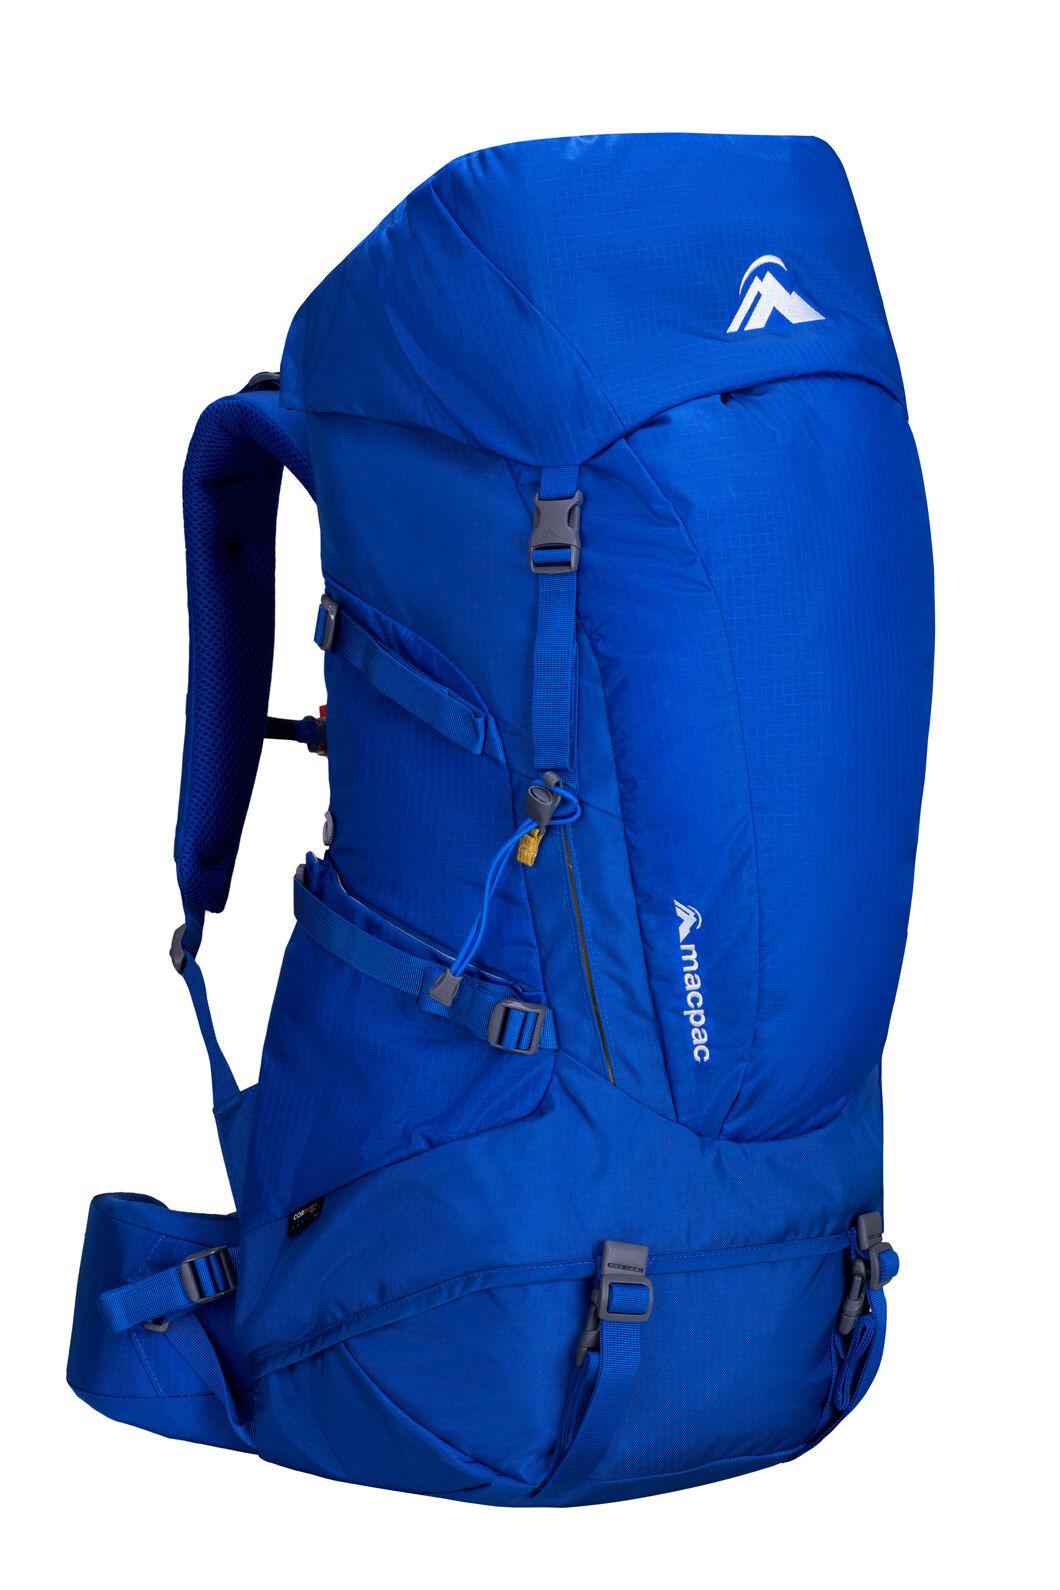 Torlesse 50L Hiking Pack, Nautical Blue, hi-res